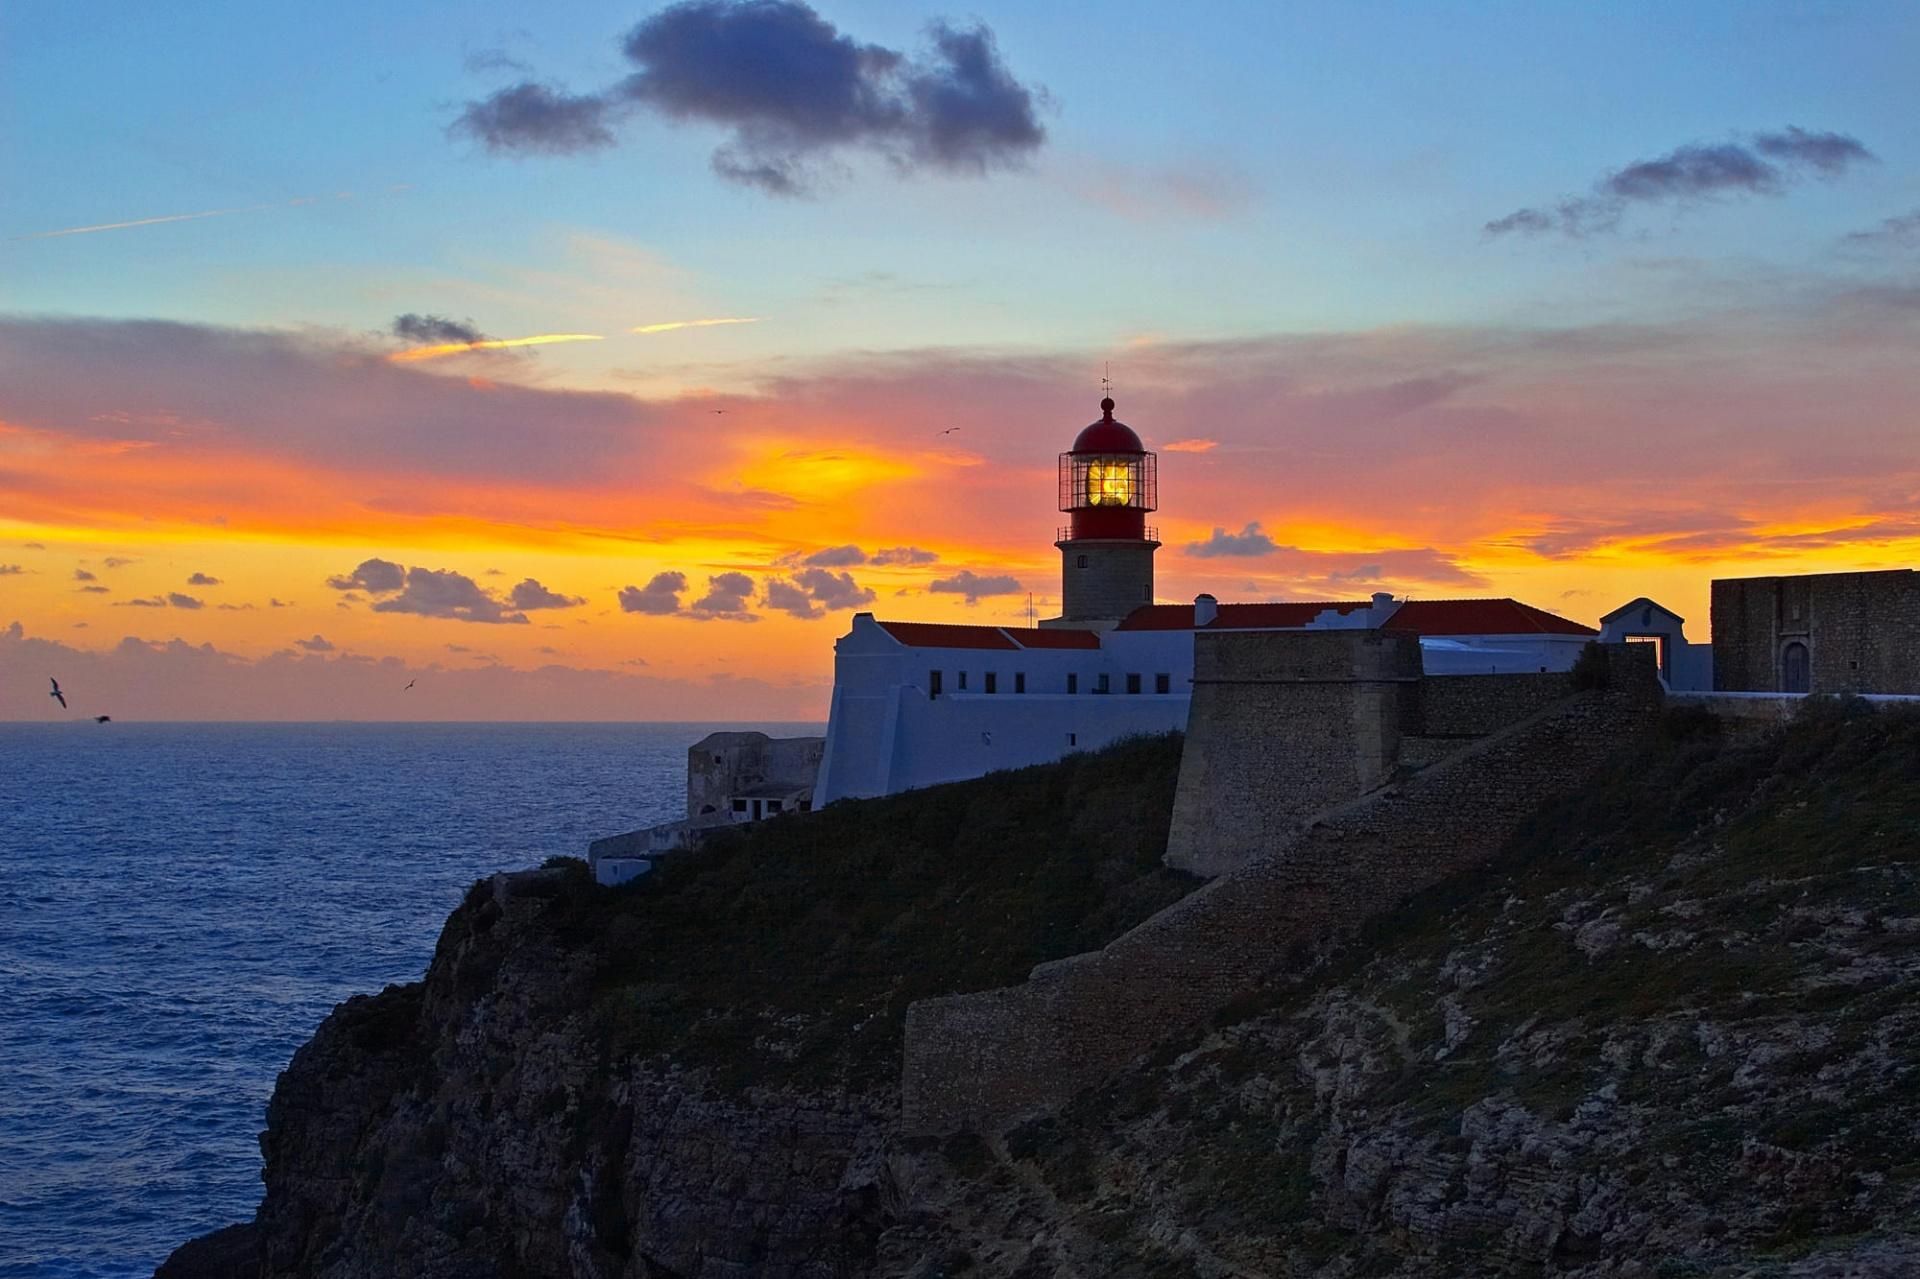 Lighthouse Screensaver, Lighthouse Desktop Screensavers - Lighting